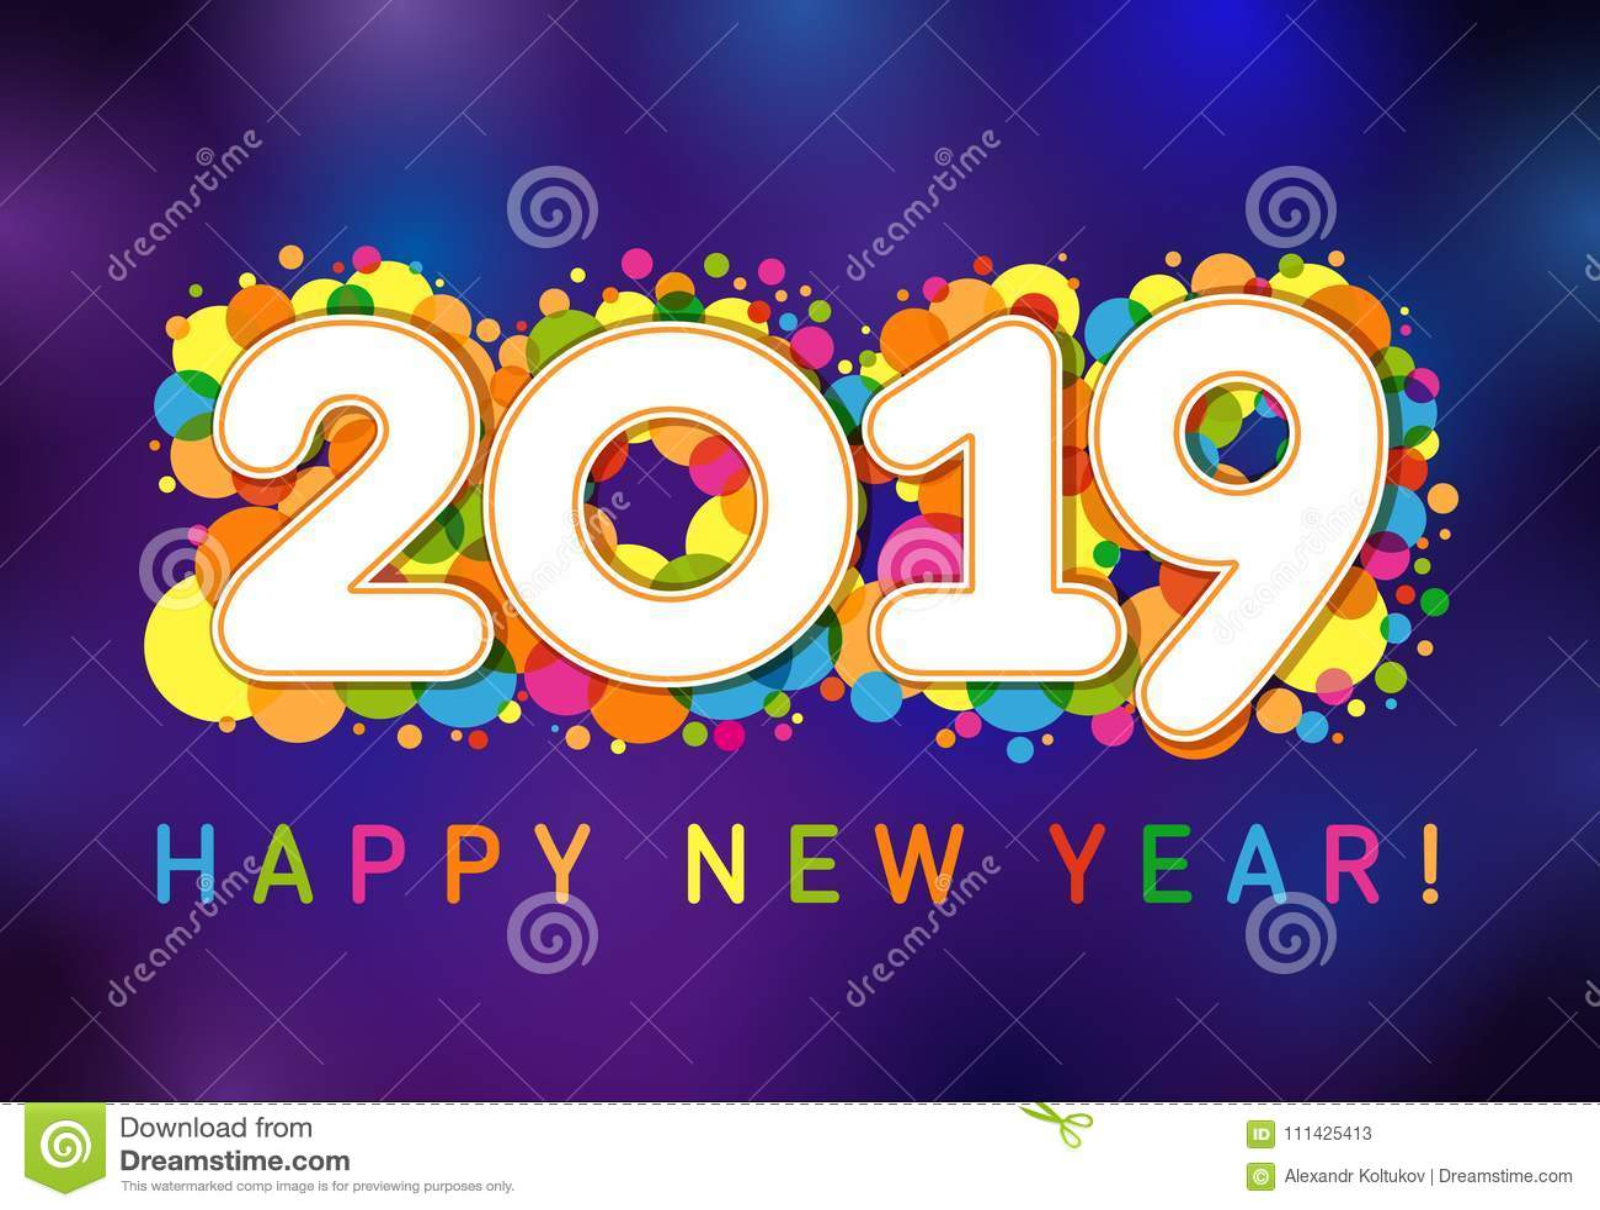 2019 Happy New Year Xmas Greetings. Stock Vector - Illustration of ...